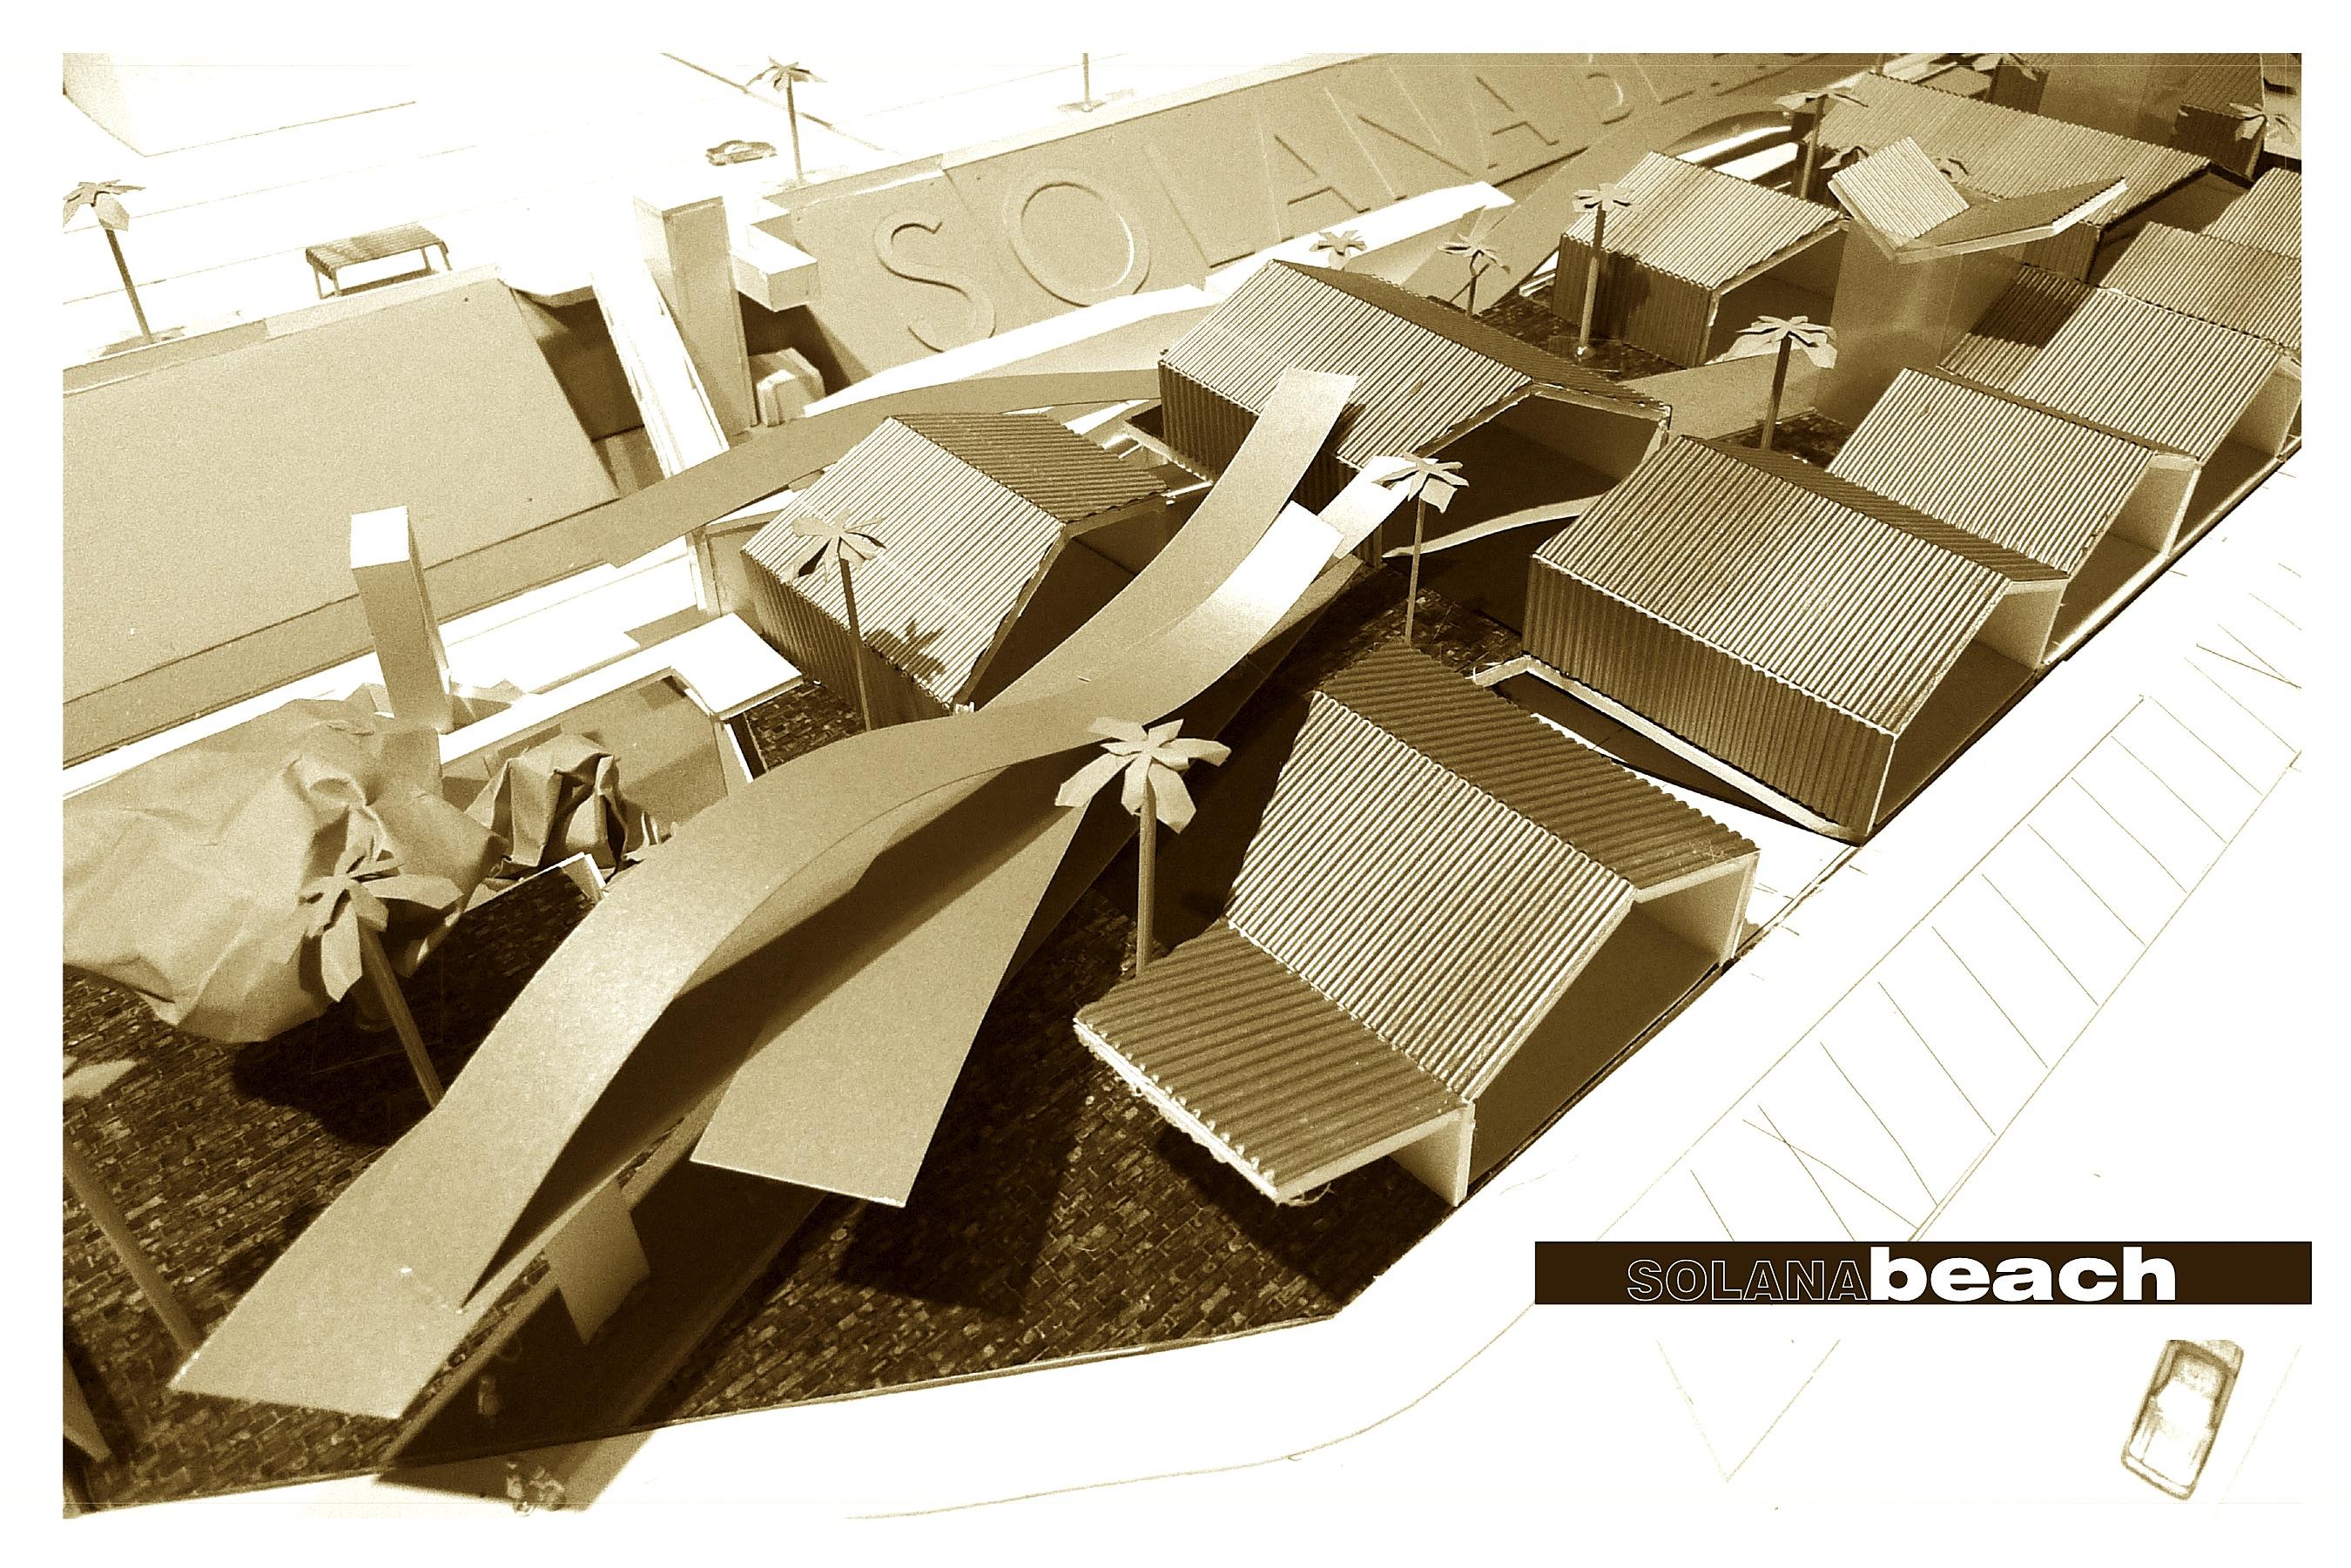 Solana Beach Development